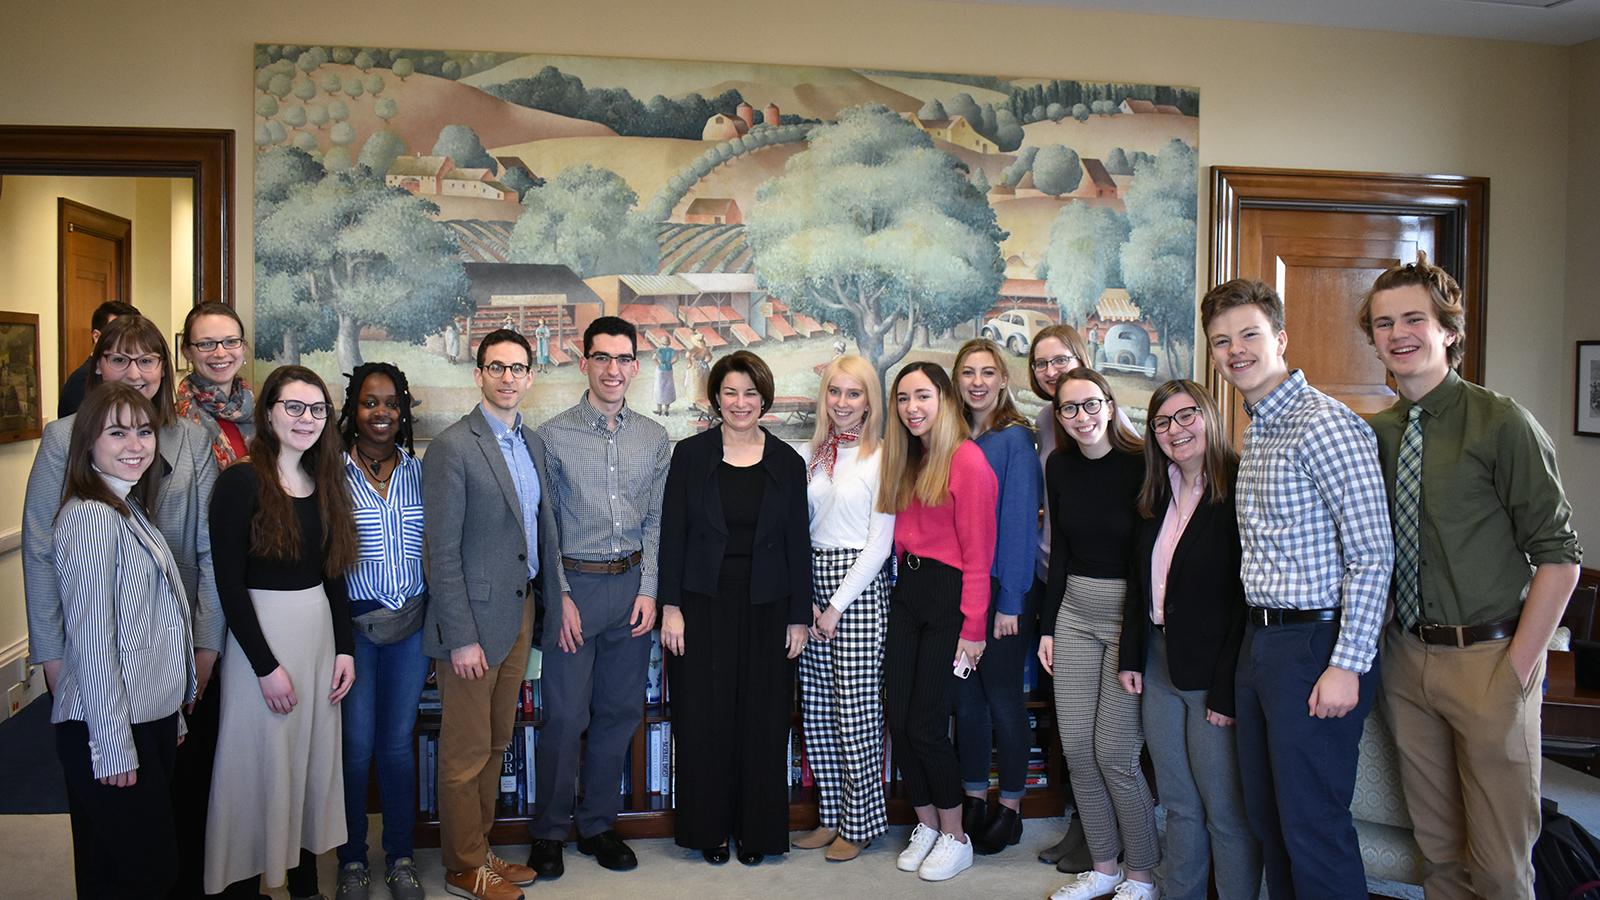 U.S. Senator Amy Klobuchar (center) welcomes a St. Olaf Interim class to her Senate office in Washington, D.C.